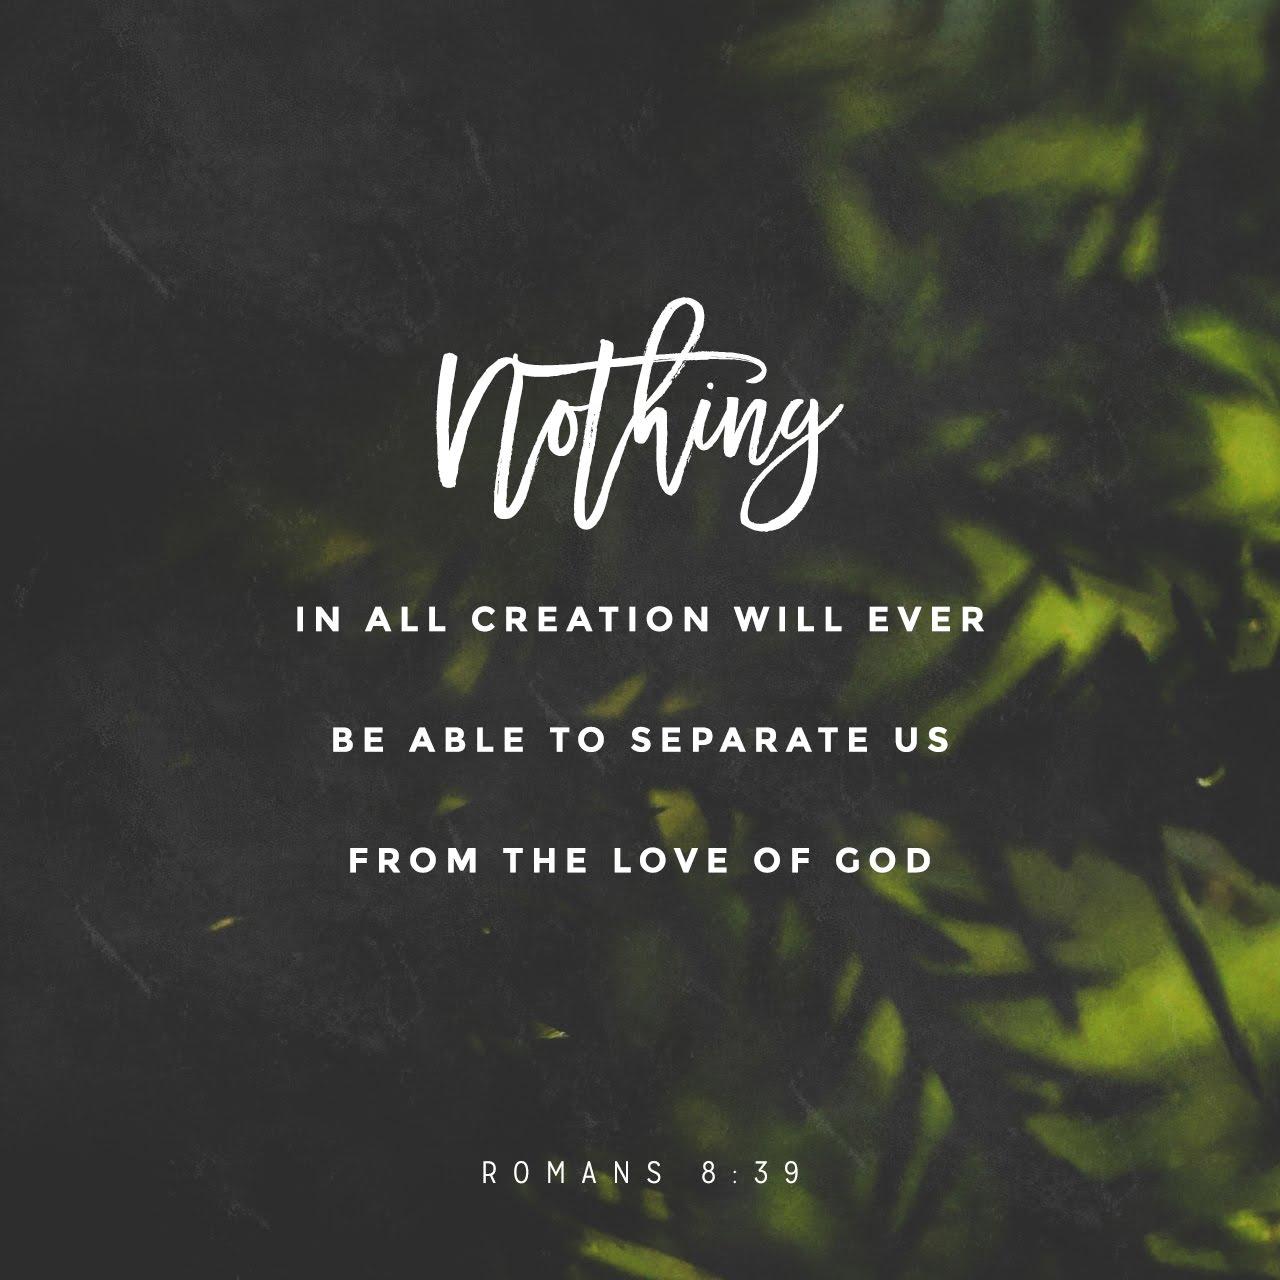 ScriptureArt_0817_-_Romans_8_39_NLT_English.jpg